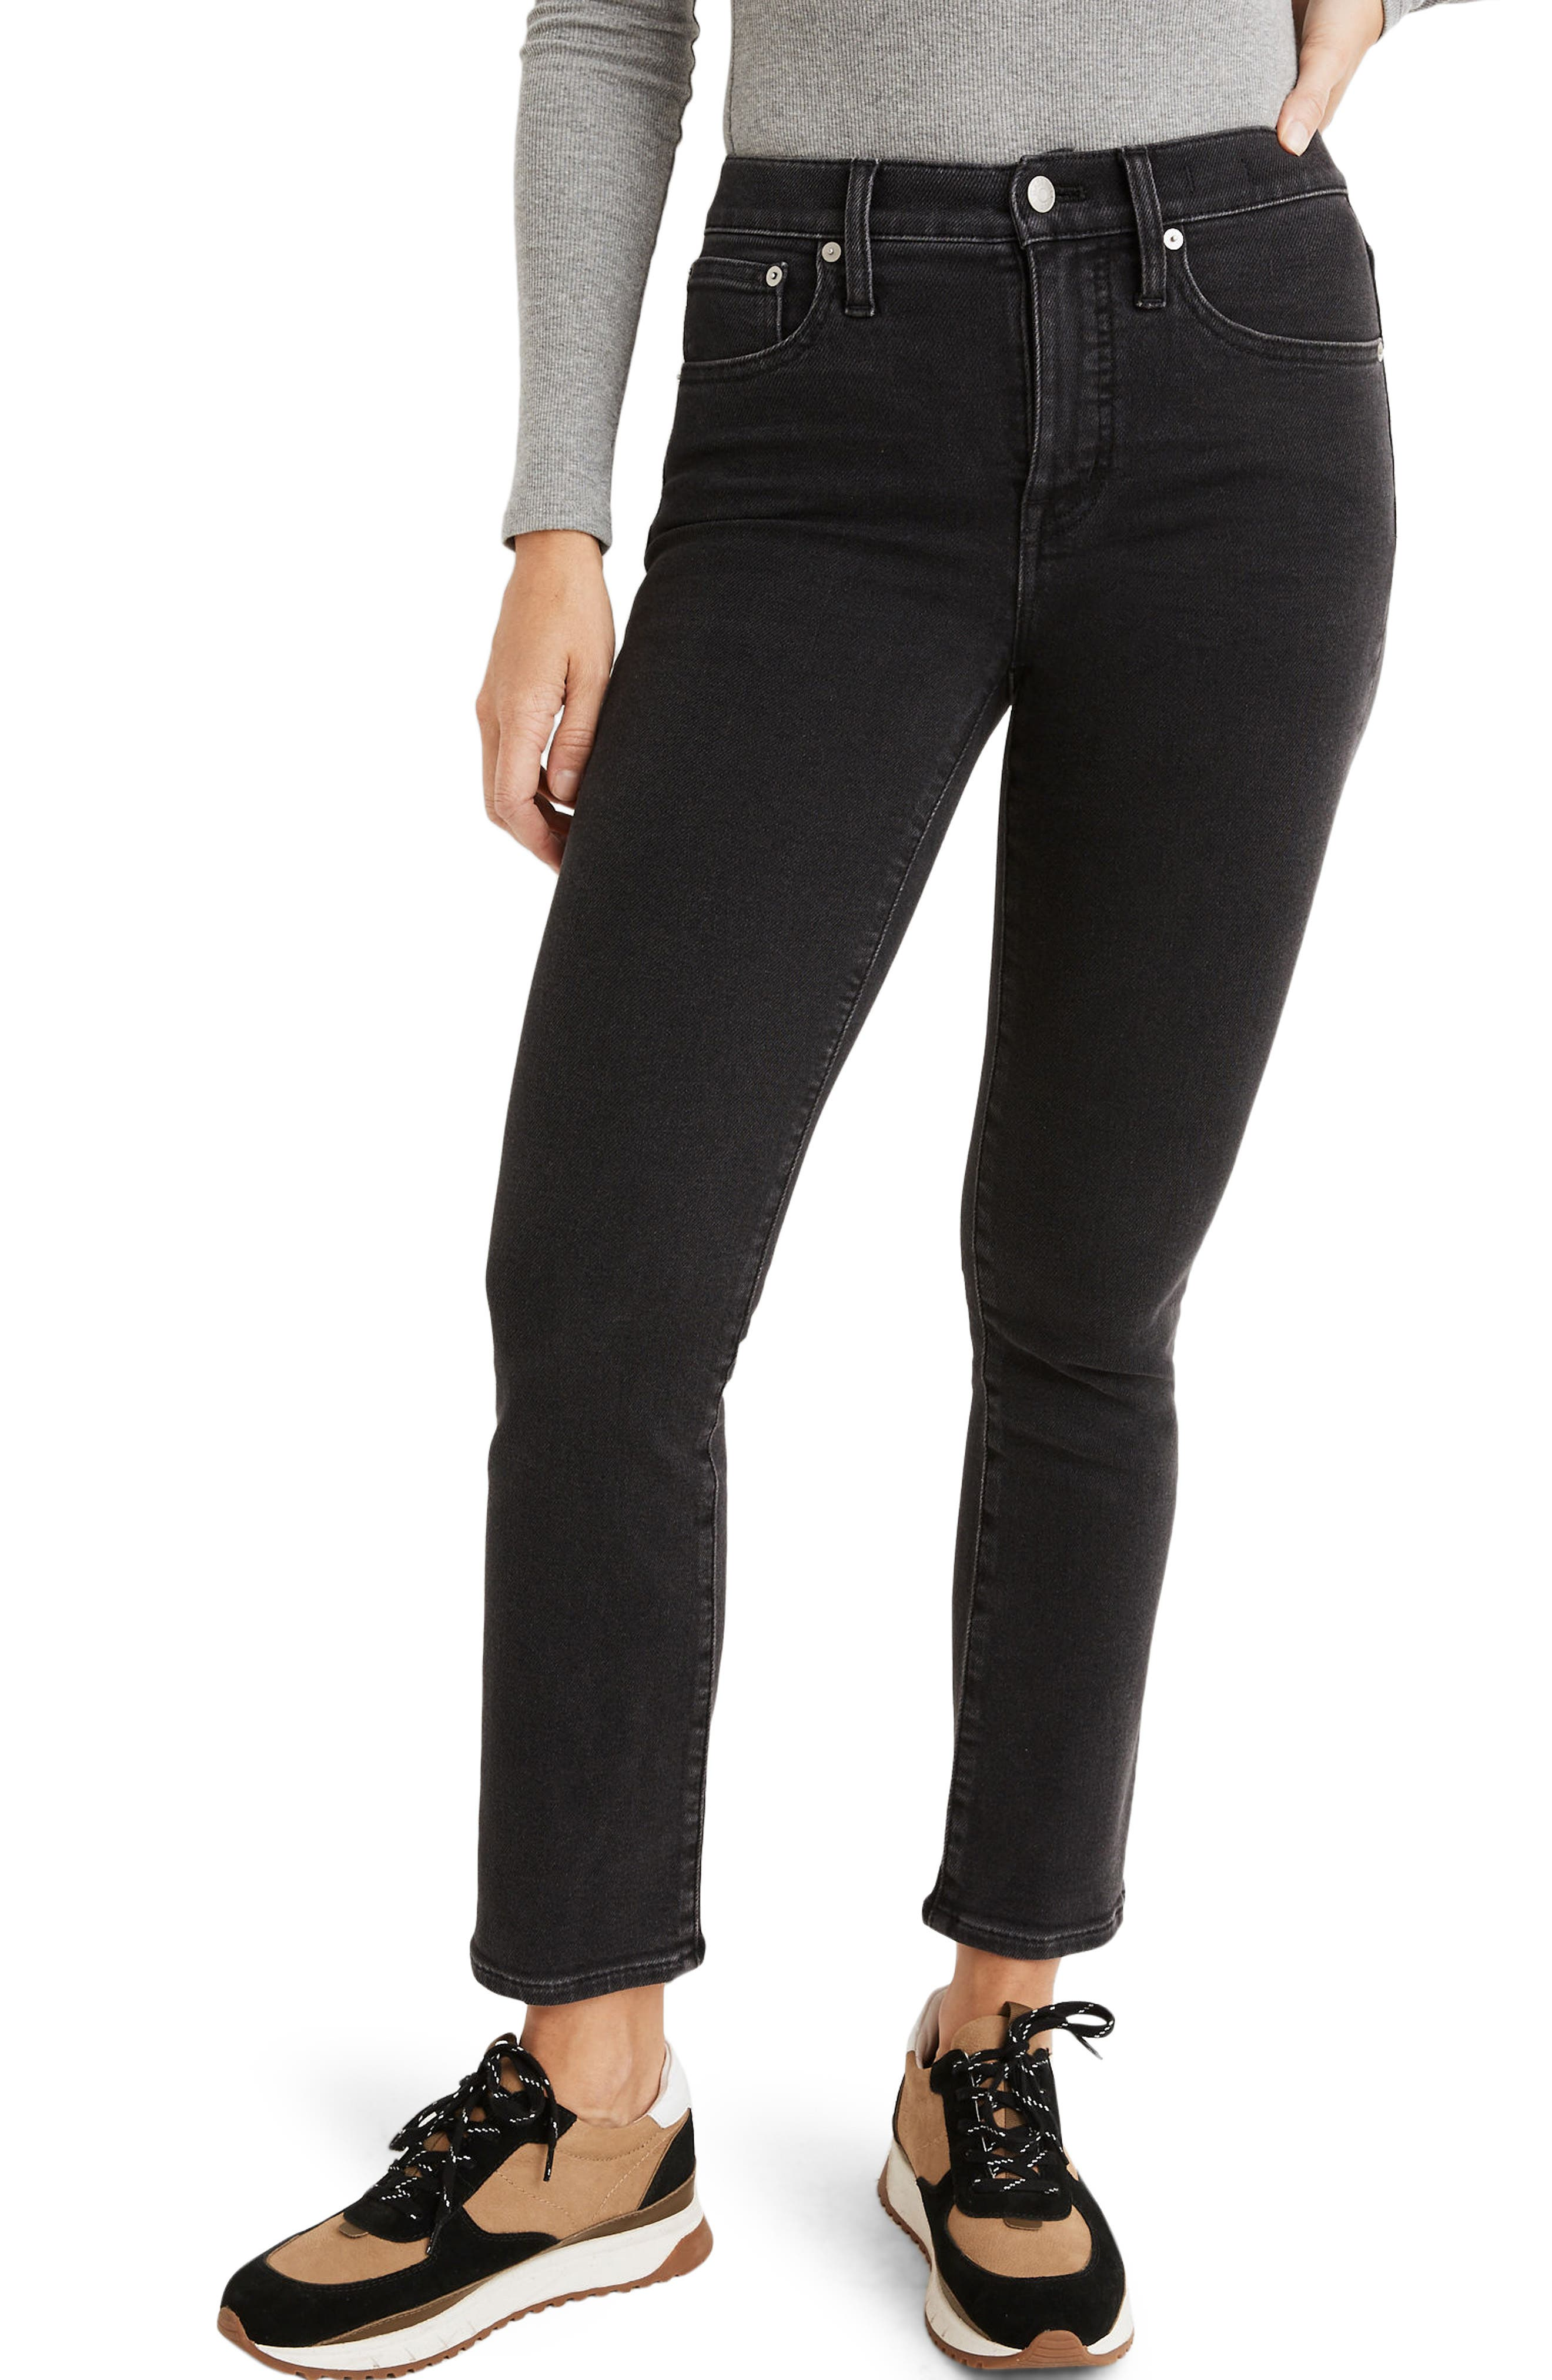 Madewell Cali Demi Boot Jeans (Starkey) (Regular & Plus Size) | Nordstrom